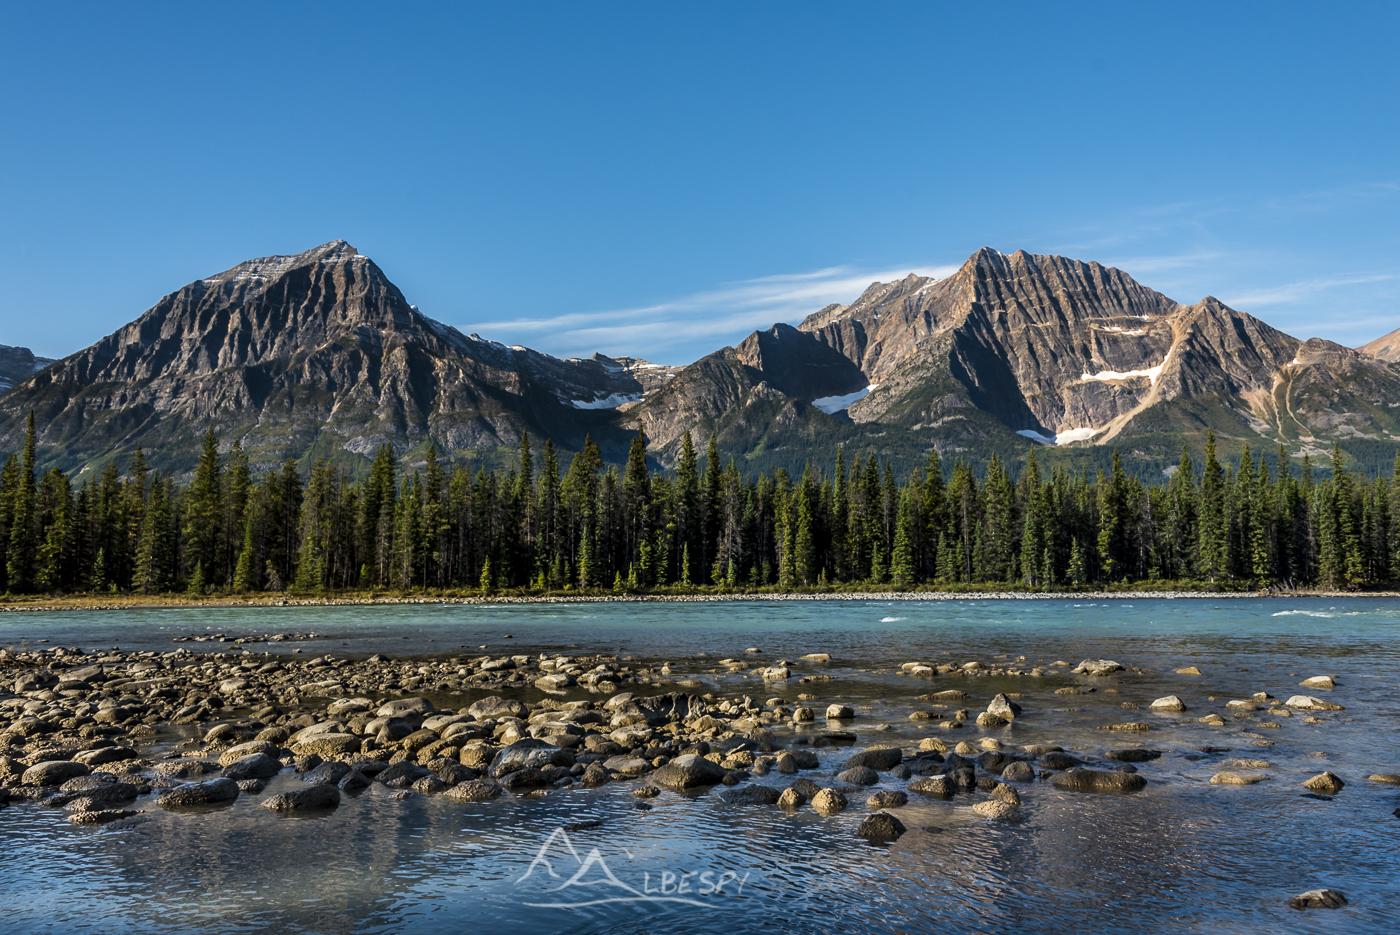 Friatt E5 N4 (Parc National de Jasper - Alberta) n°0610